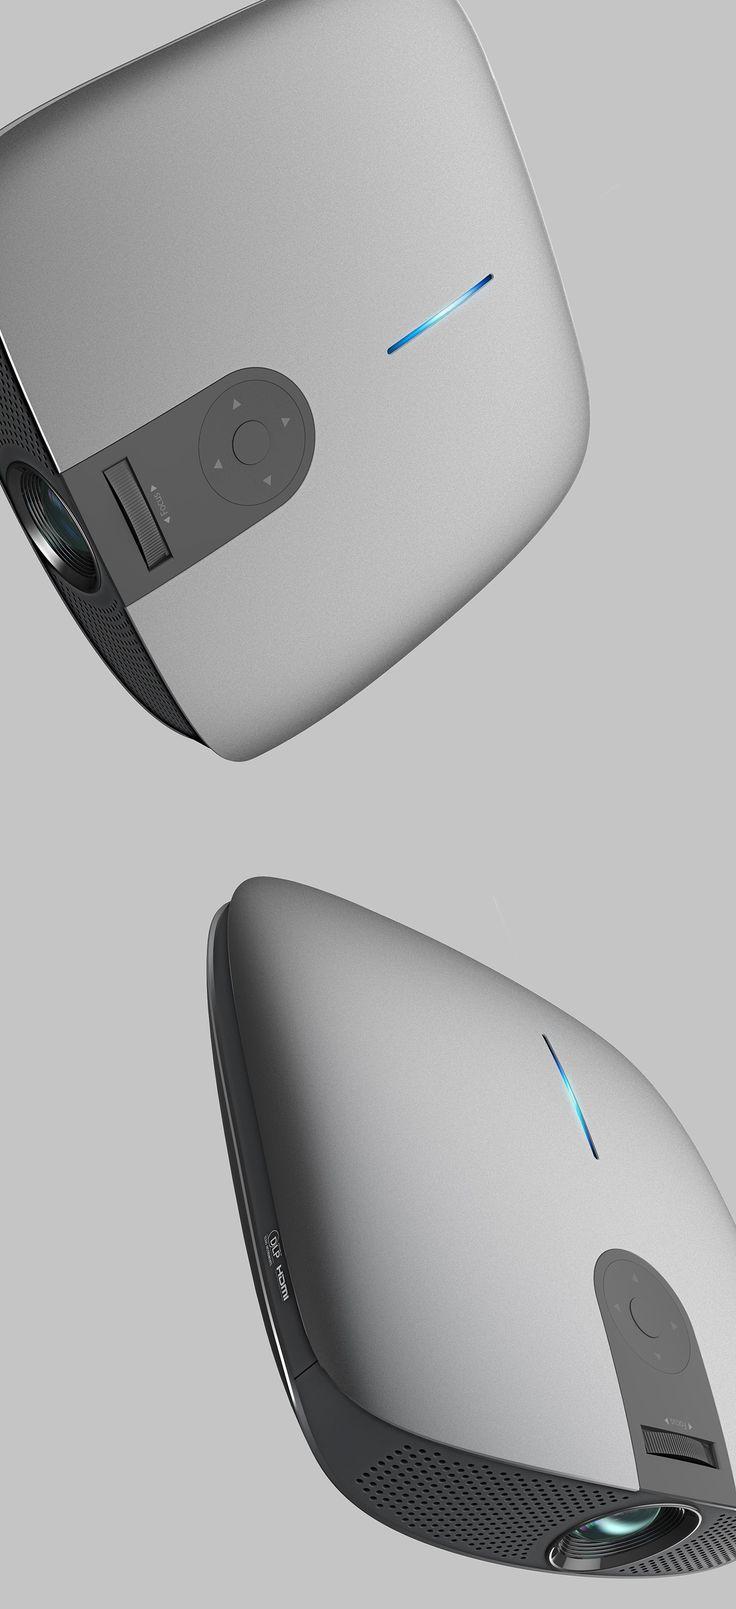 Consultez ce projet @Behance : \u201cProjector_product design\u201d https://www.behance.net/gallery/37009047/Projector_product-design